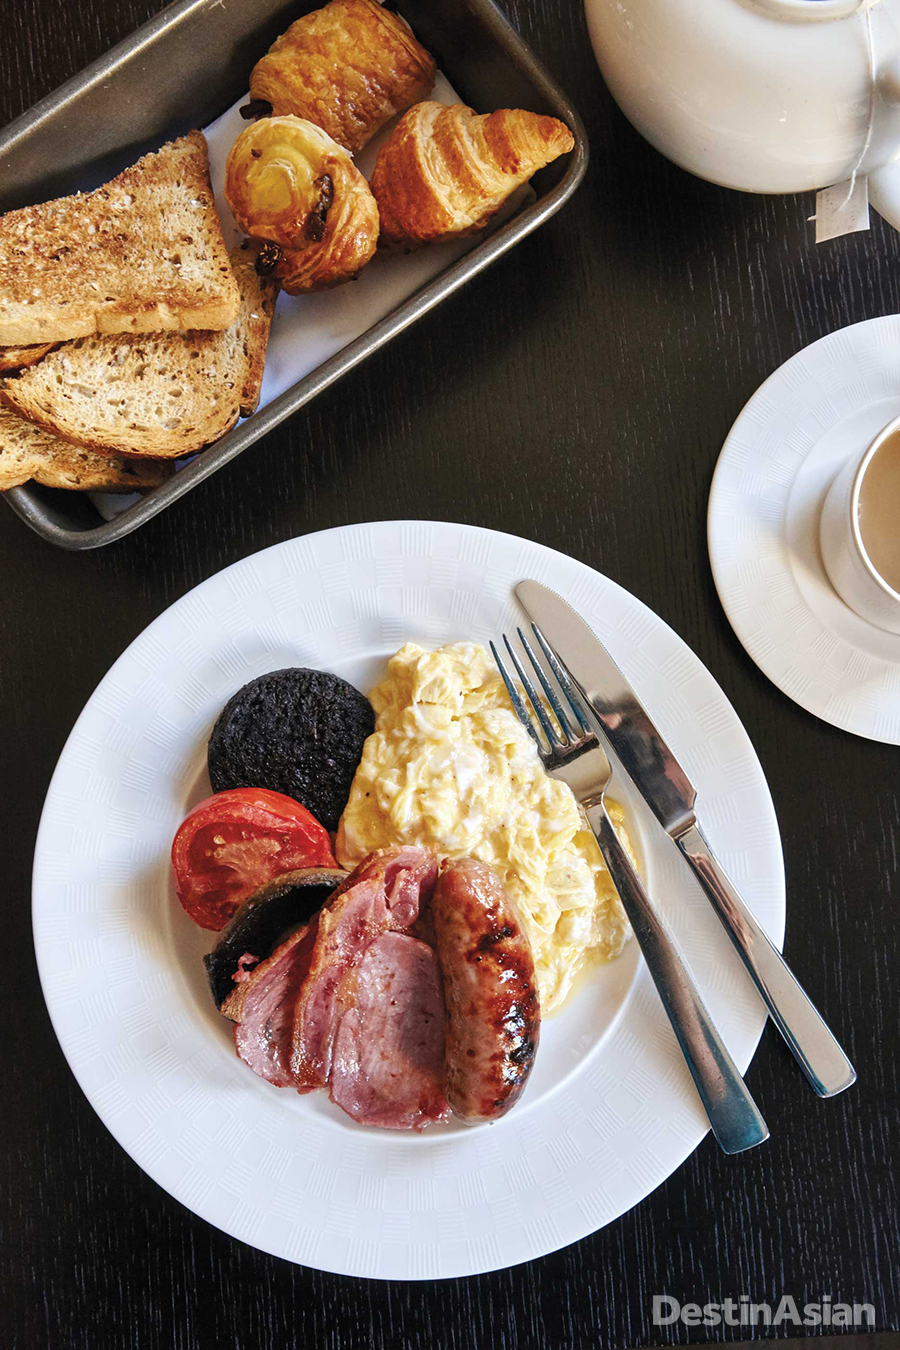 A full English breakfast at The Gainsborough Bath Spa.